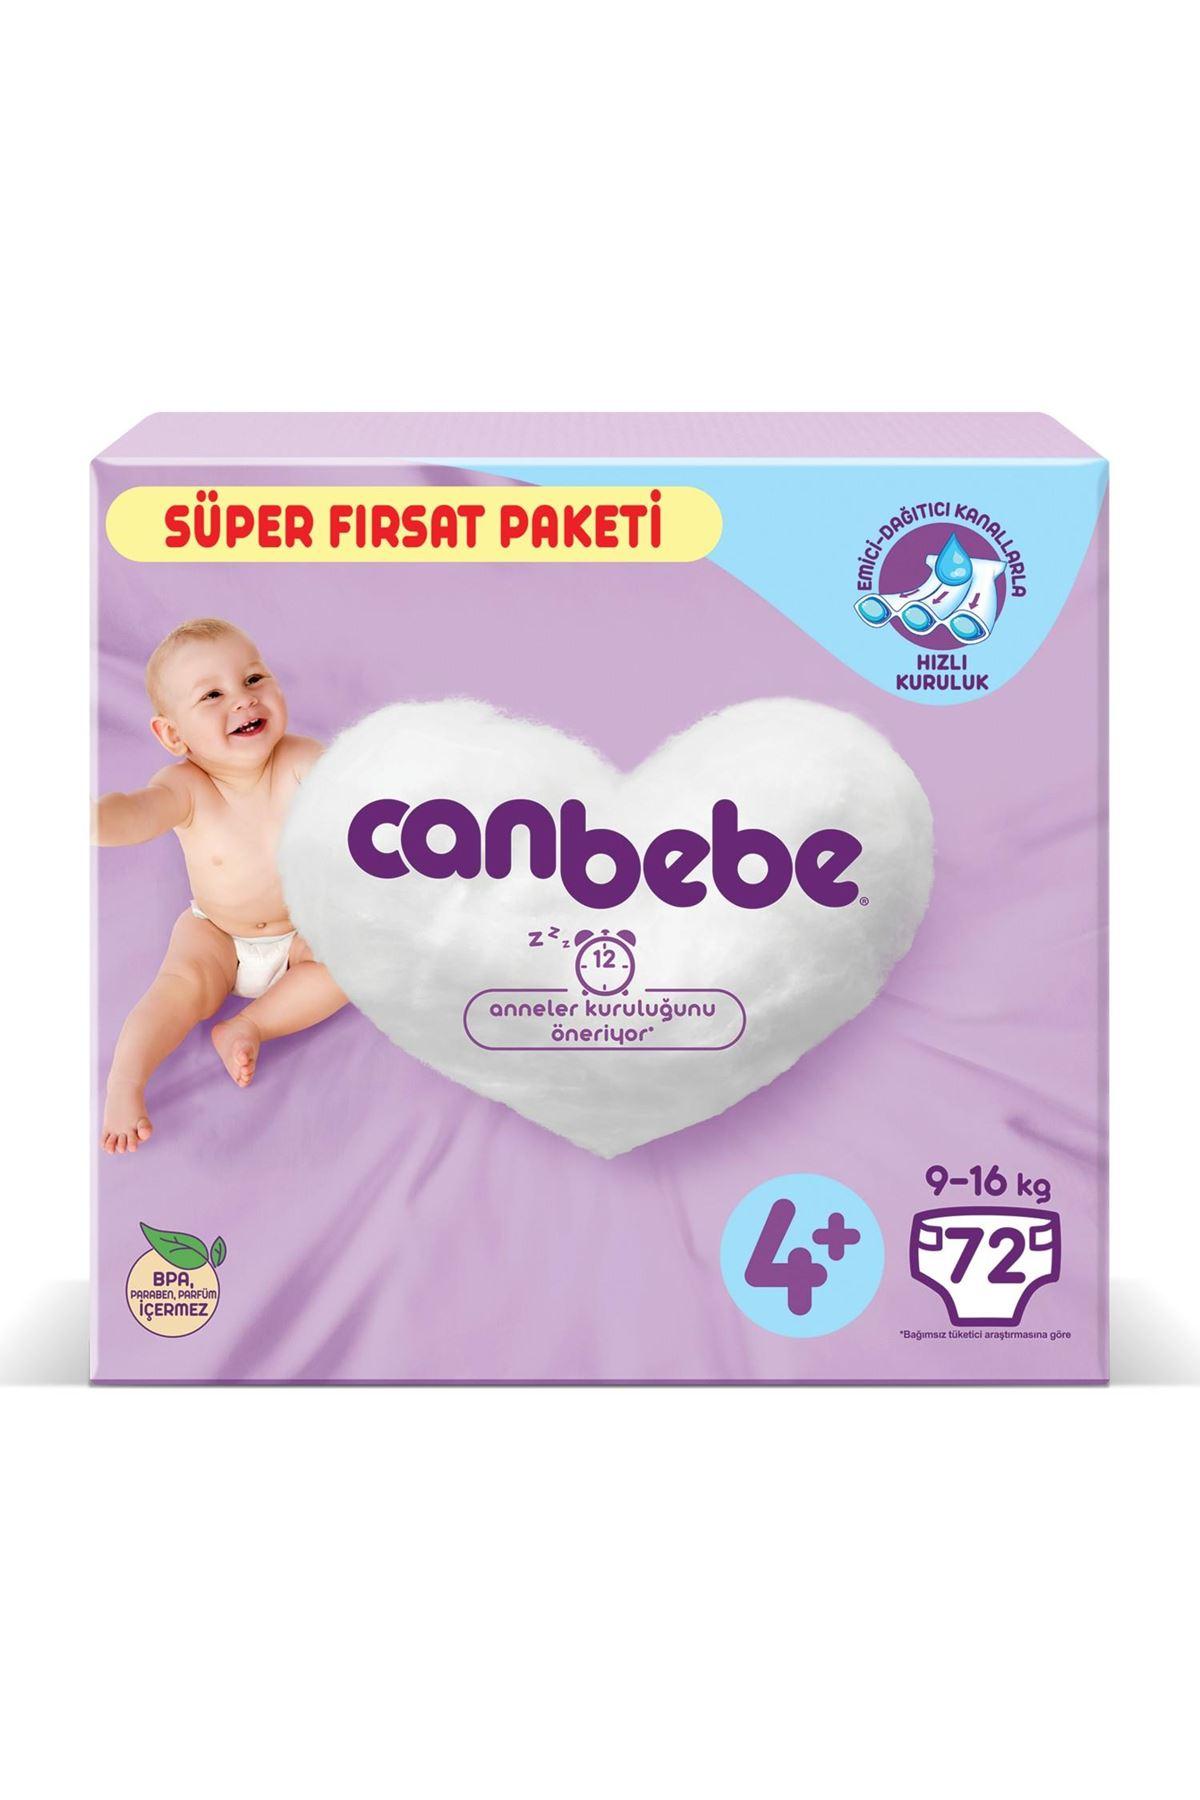 Canbebe Bebek Bezi Süper Fırsat Paketi 4+ Beden 9-16 Kg 72 Adet